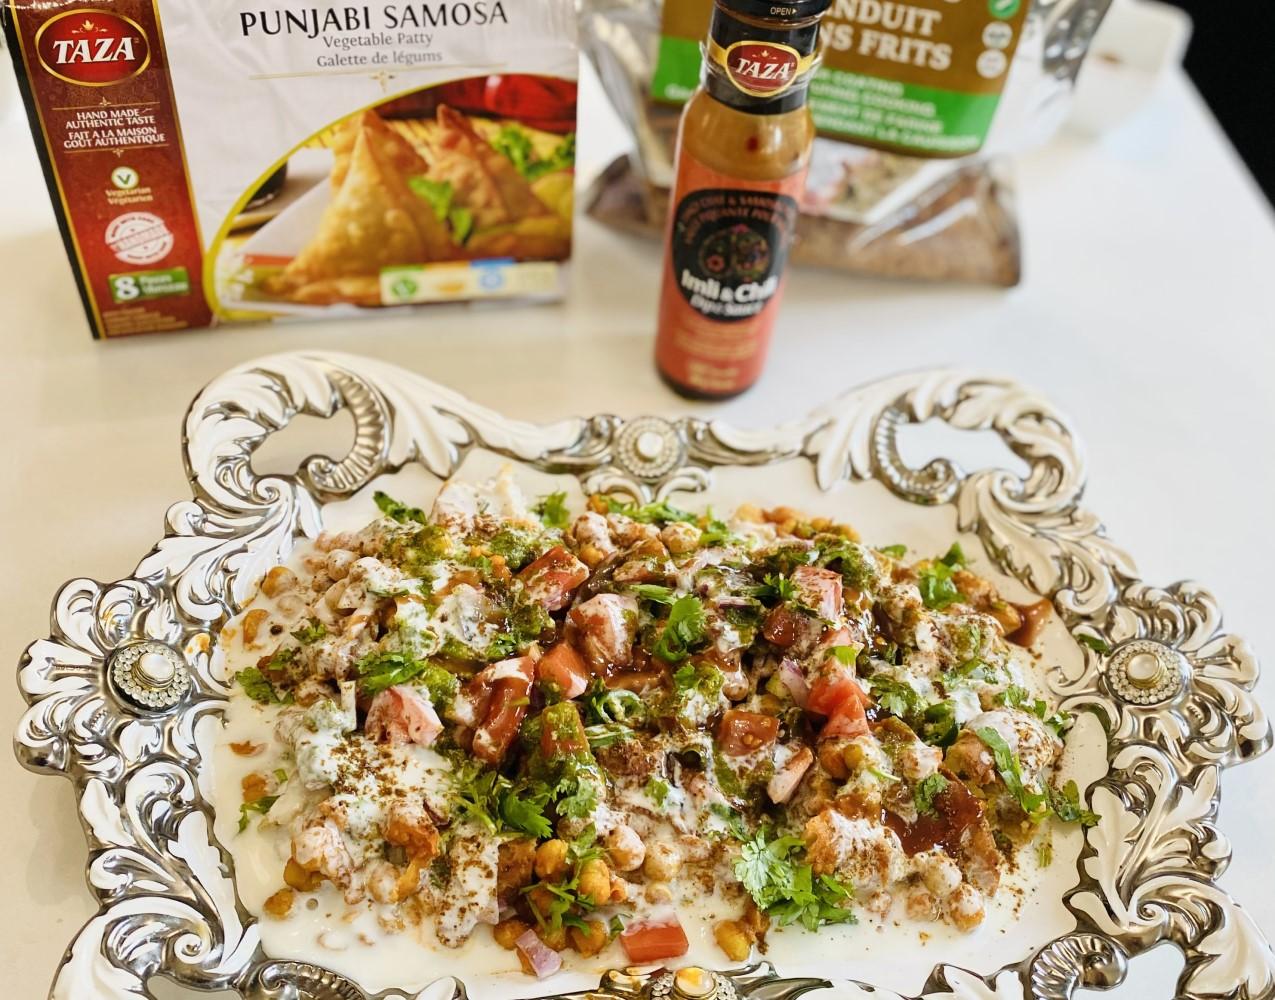 Easy Iftar Recipe: Chaat with Taza Punjabi Samosas